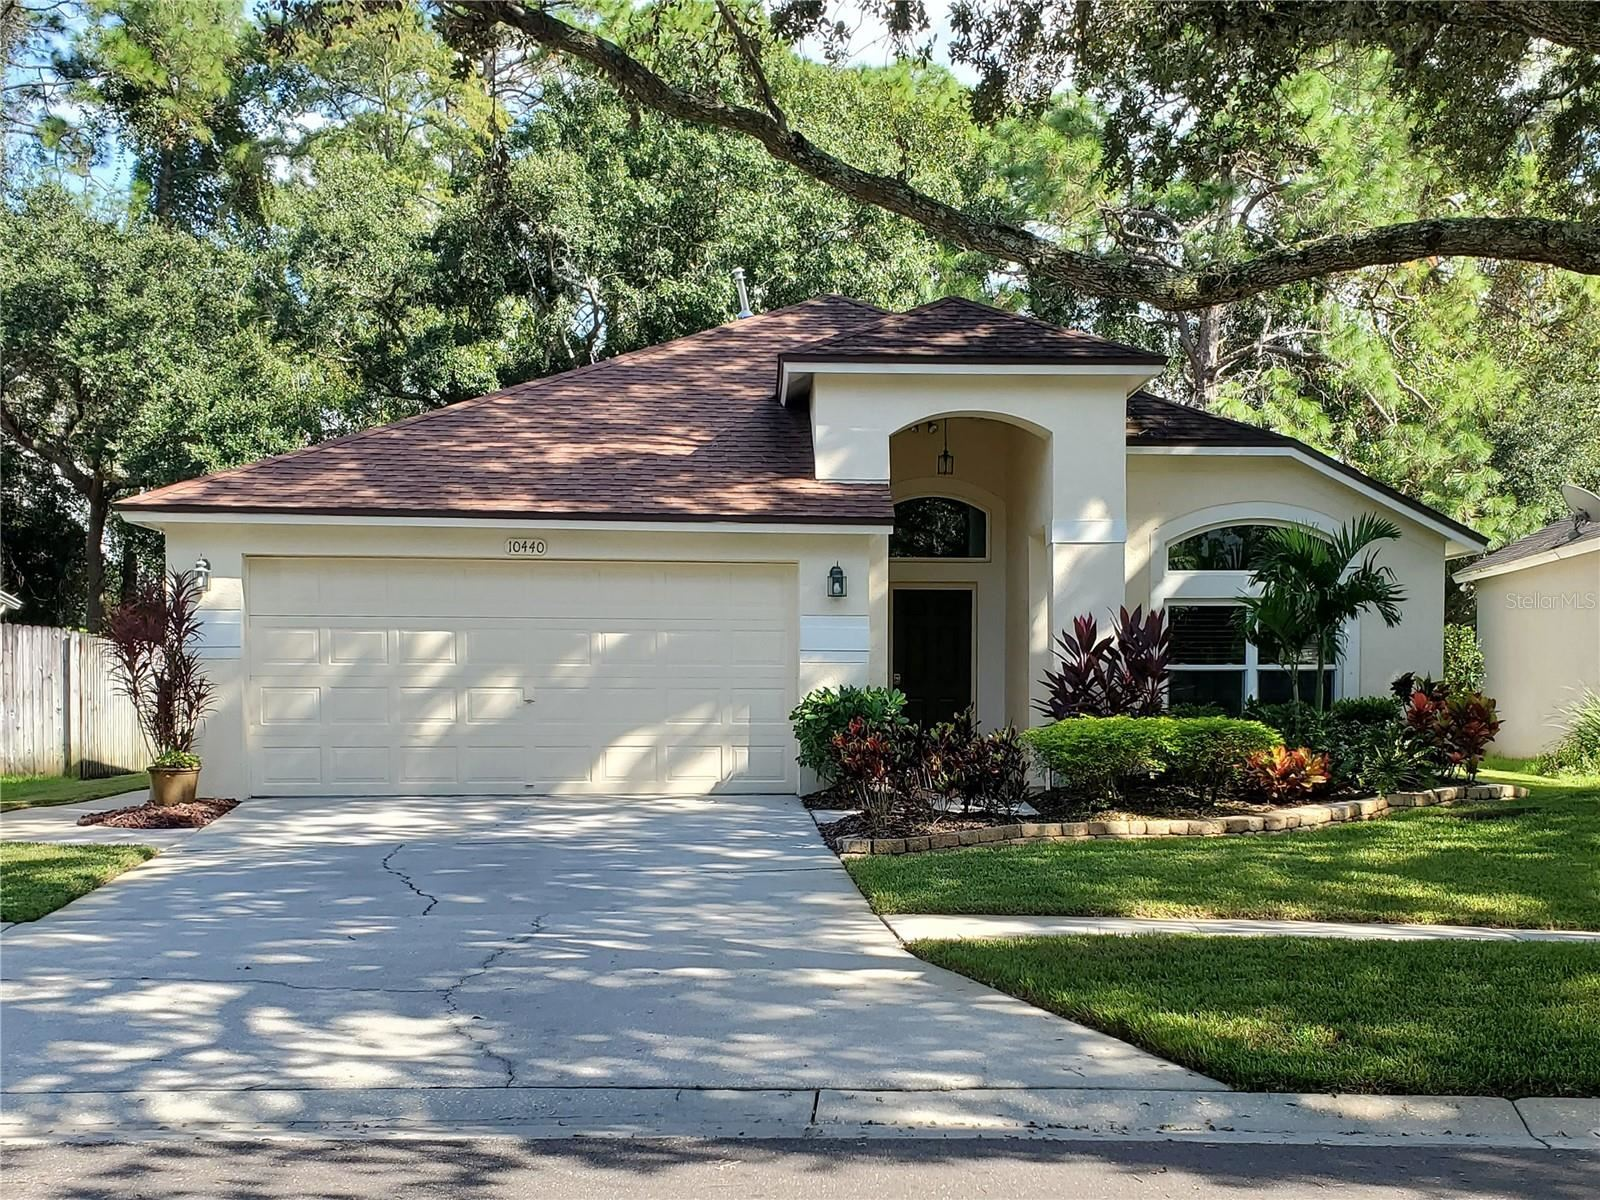 10440 SPRINGROSE DRIVE, Tampa, FL 33626 - MLS#: U8137023